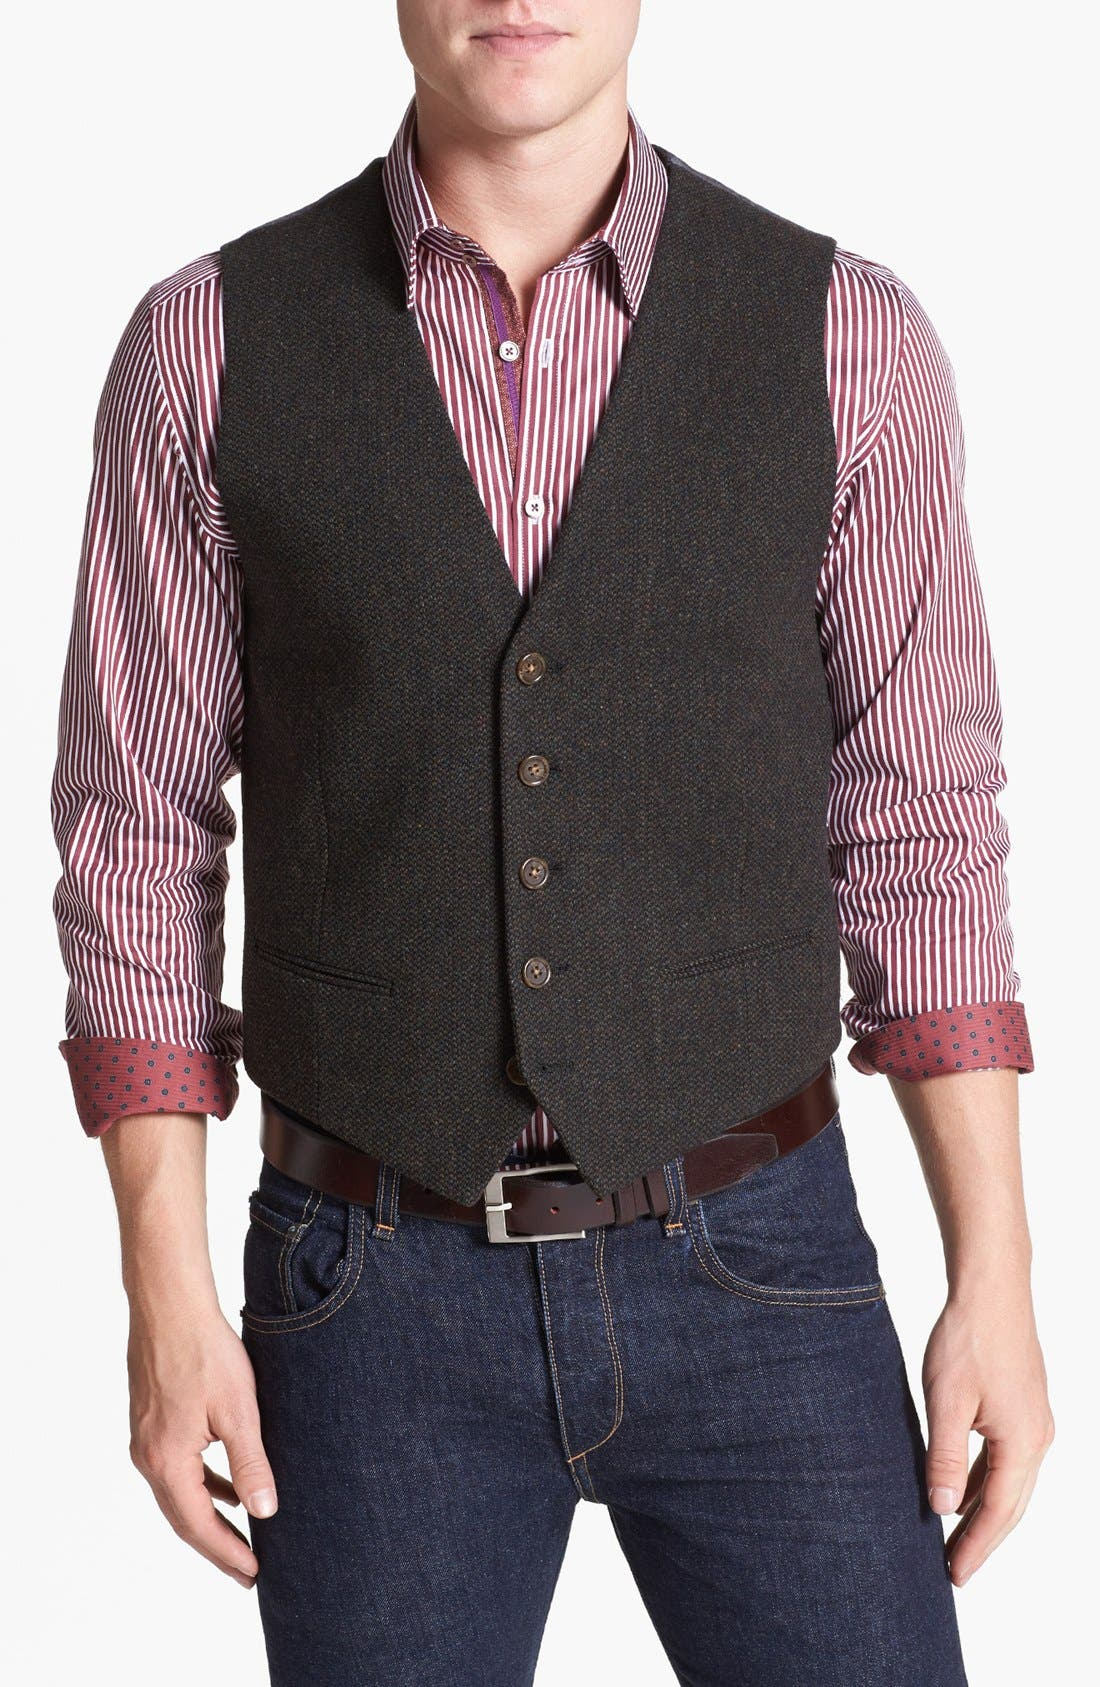 Alternate Image 1 Selected - Wallin & Bros. Trim Fit Donegal Vest